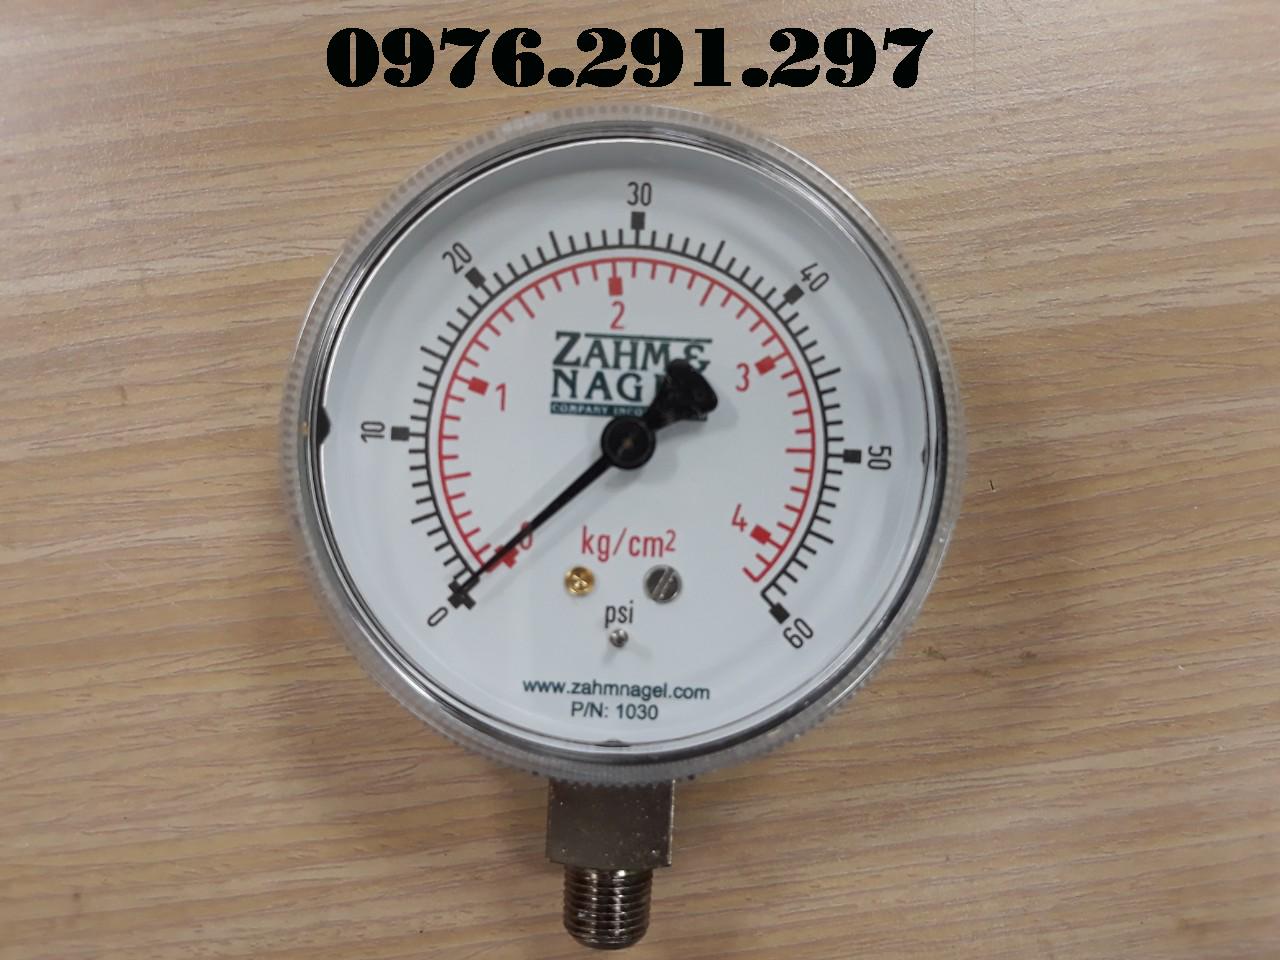 Đồng hồ áp suất 1030 Zahm Nagel